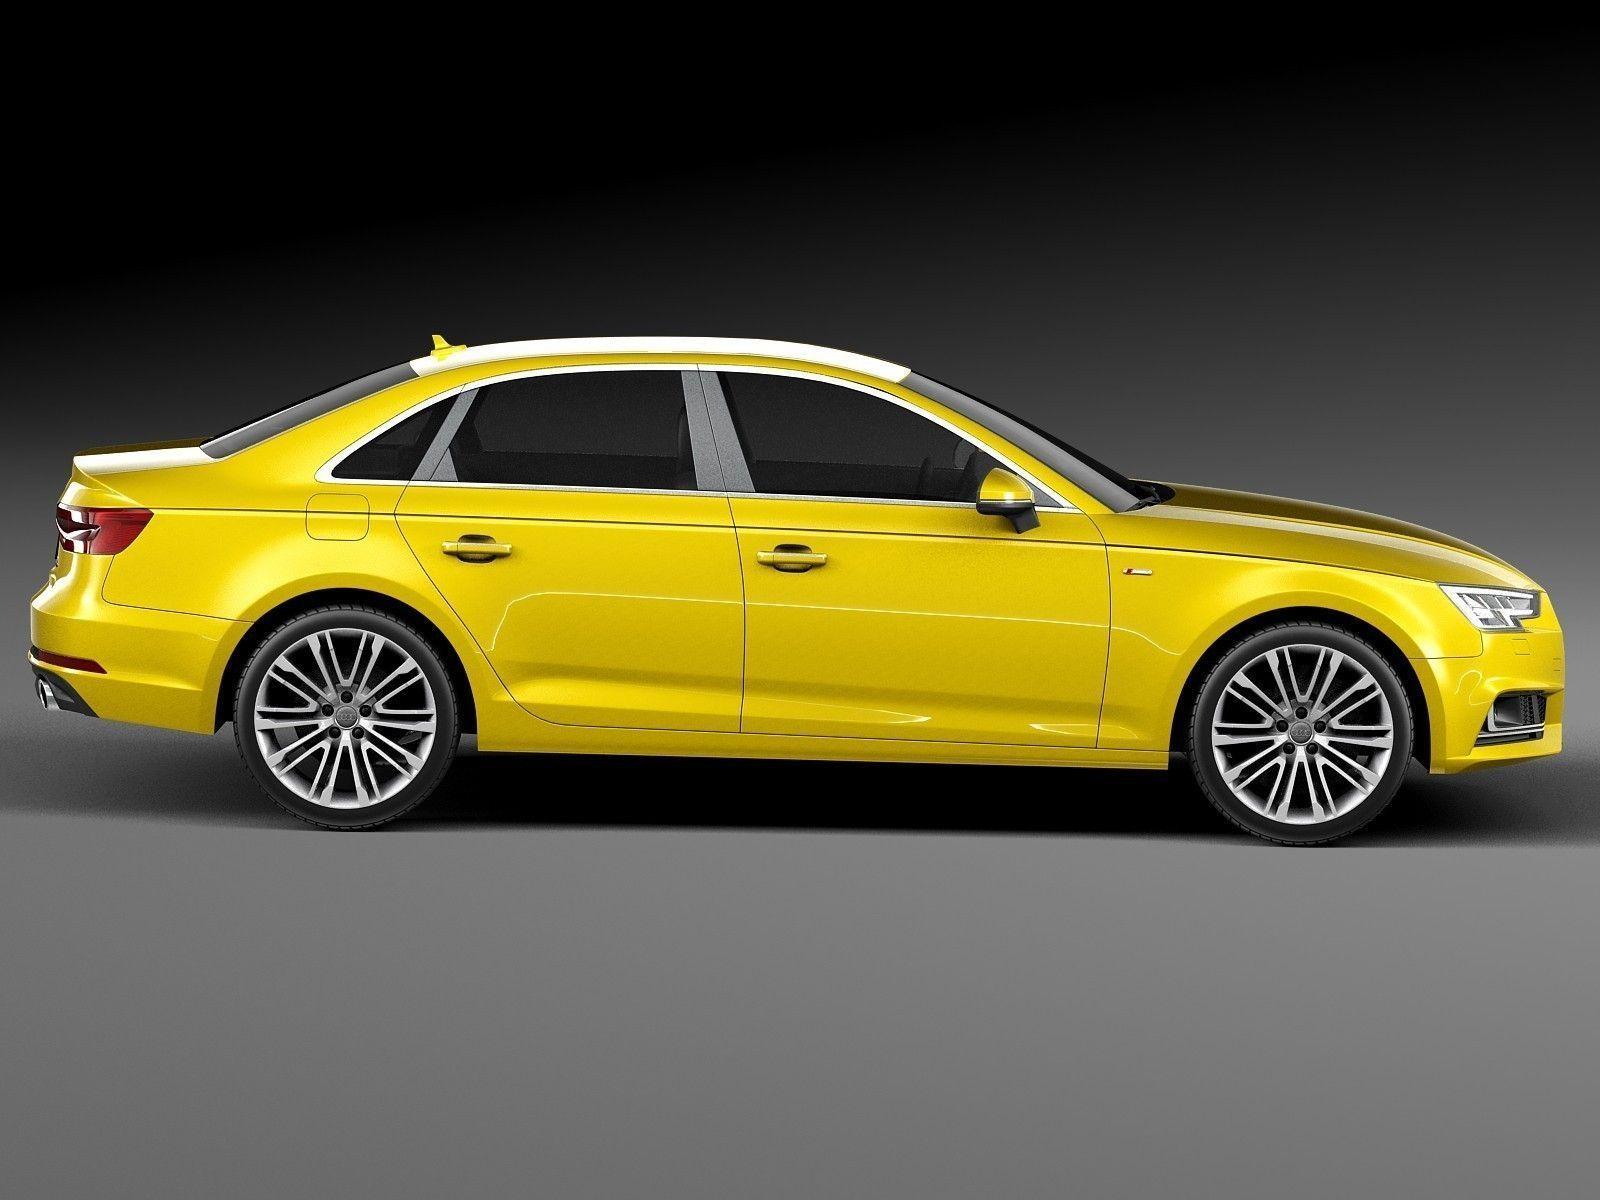 Audi A4 S-Line Sedan 2016 3D Model MAX OBJ 3DS FBX C4D LWO LW LWS | CGTrader.com